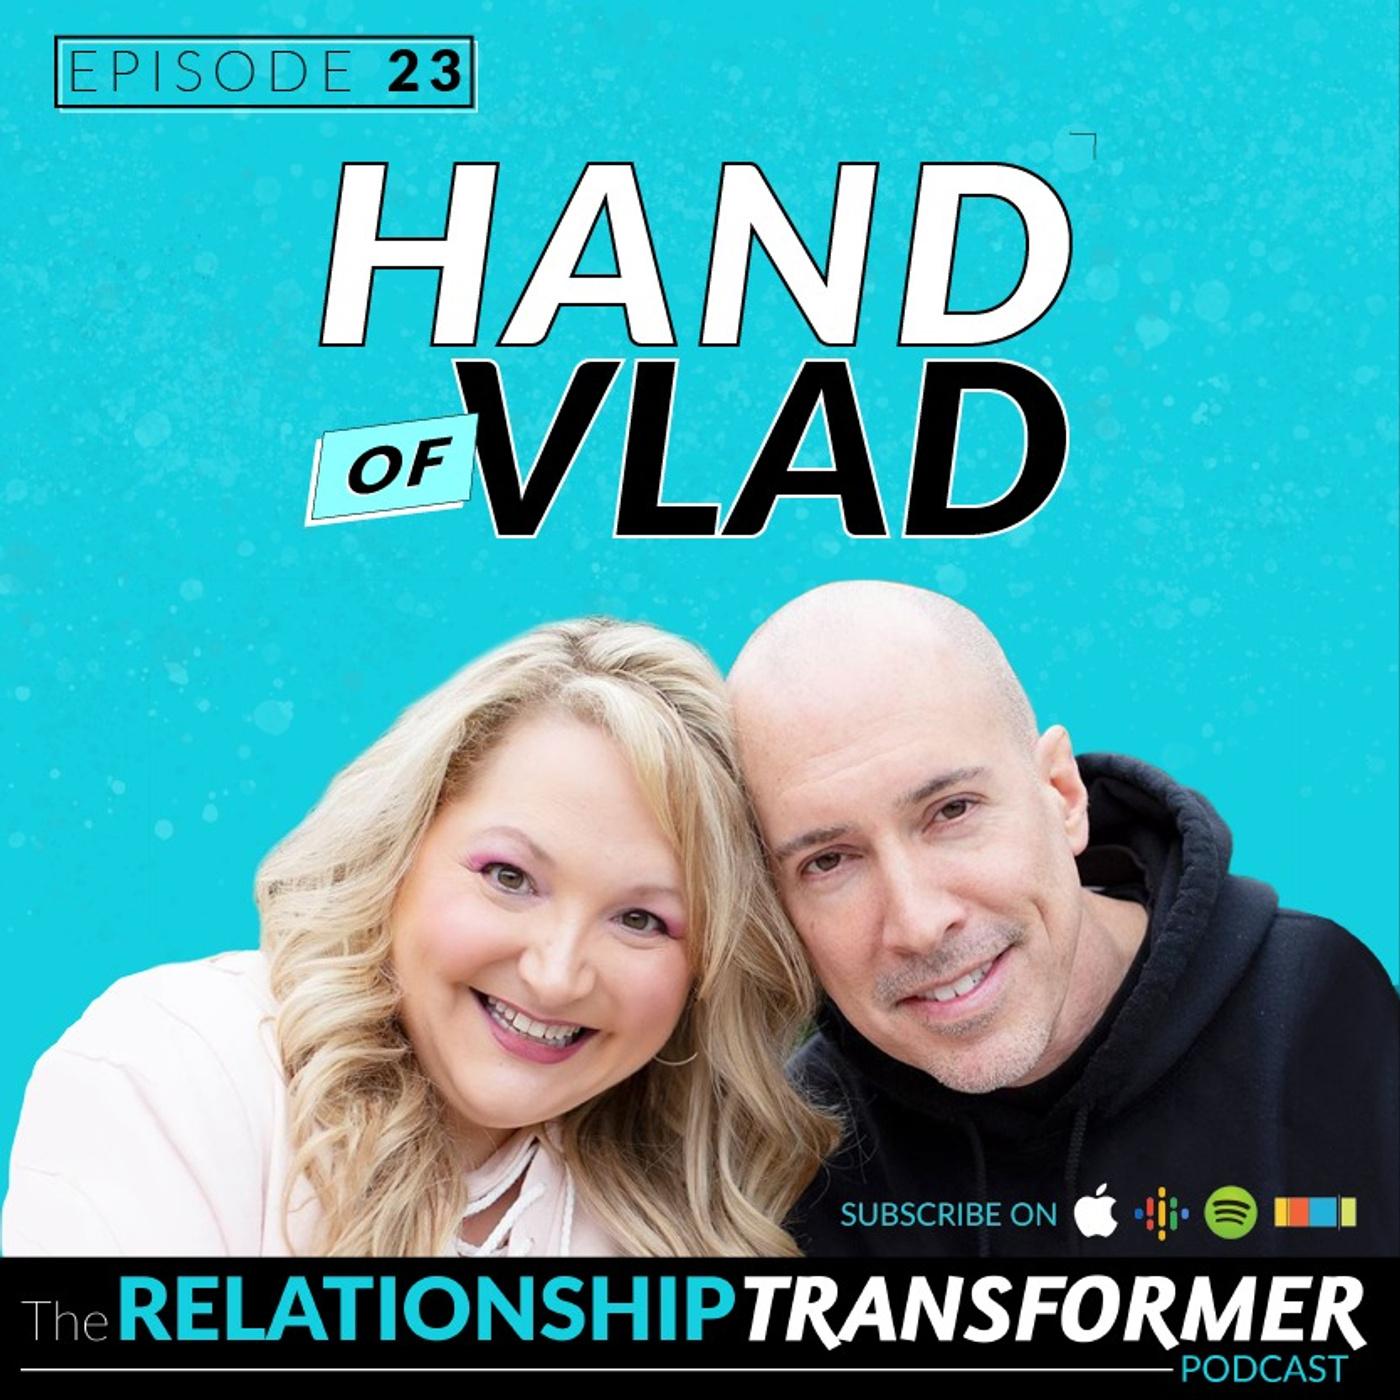 Relationship Transformers - 23: Hand of Vlad